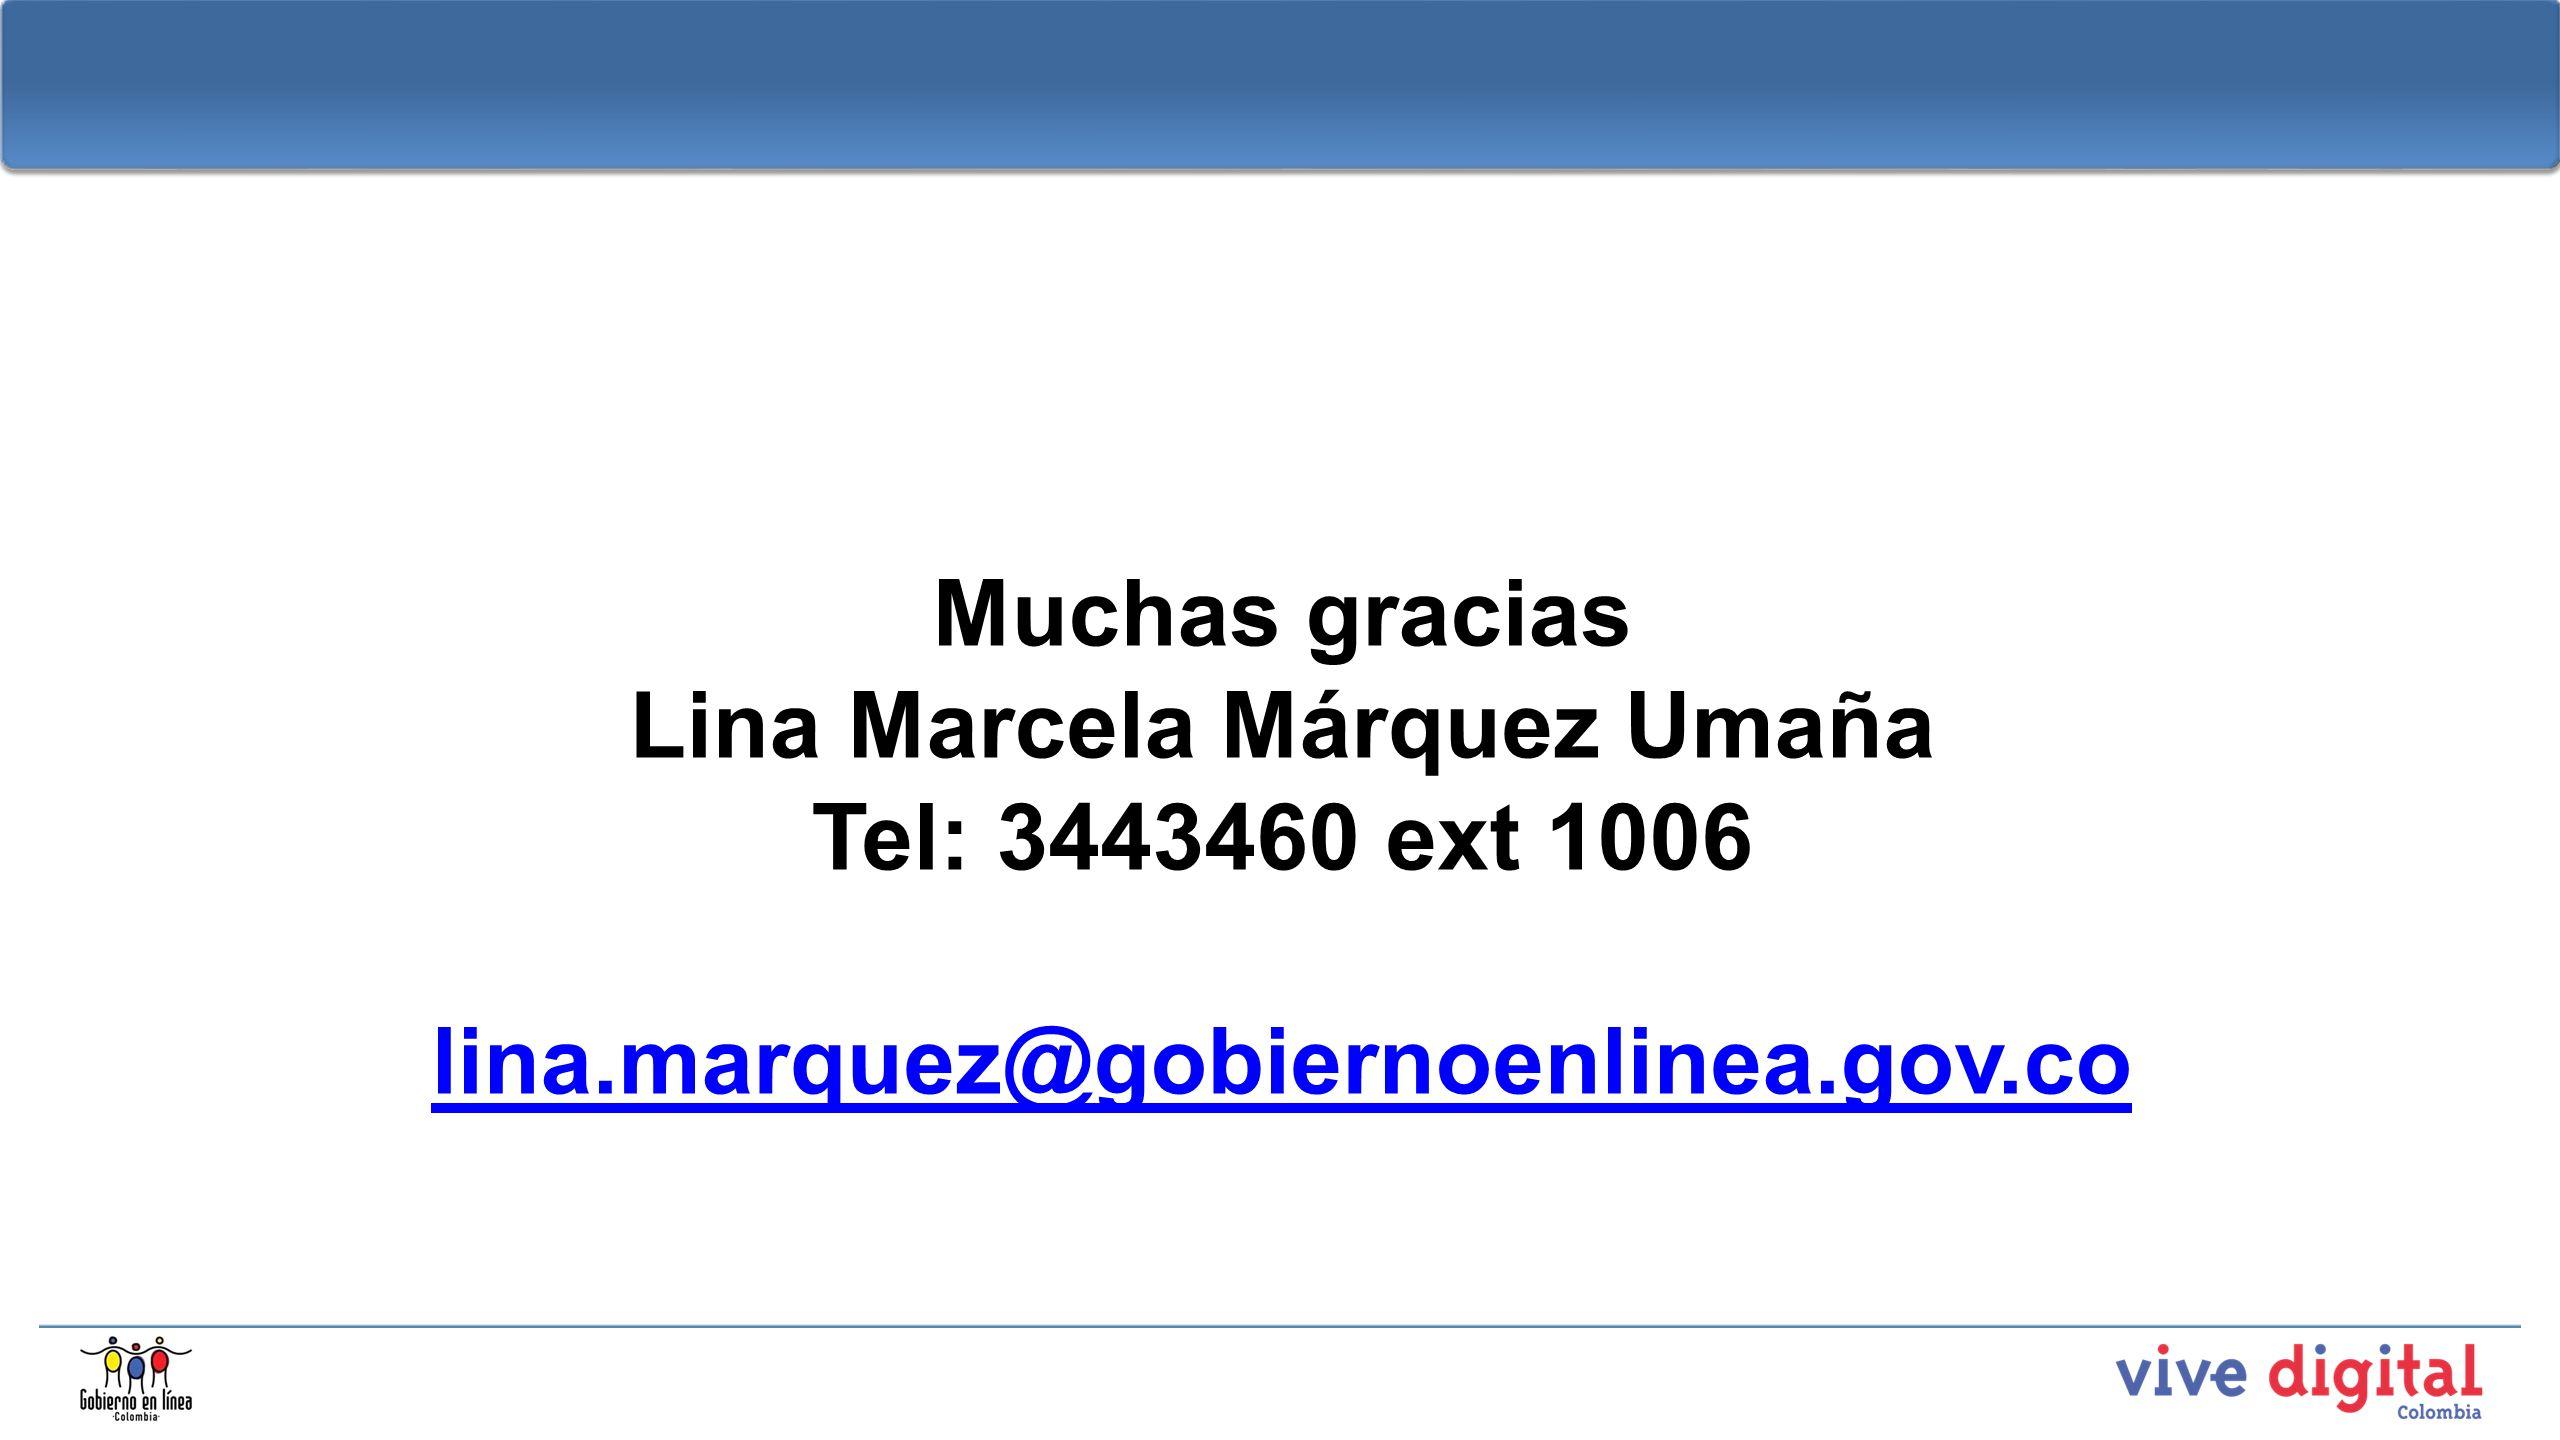 Lina Marcela Márquez Umaña